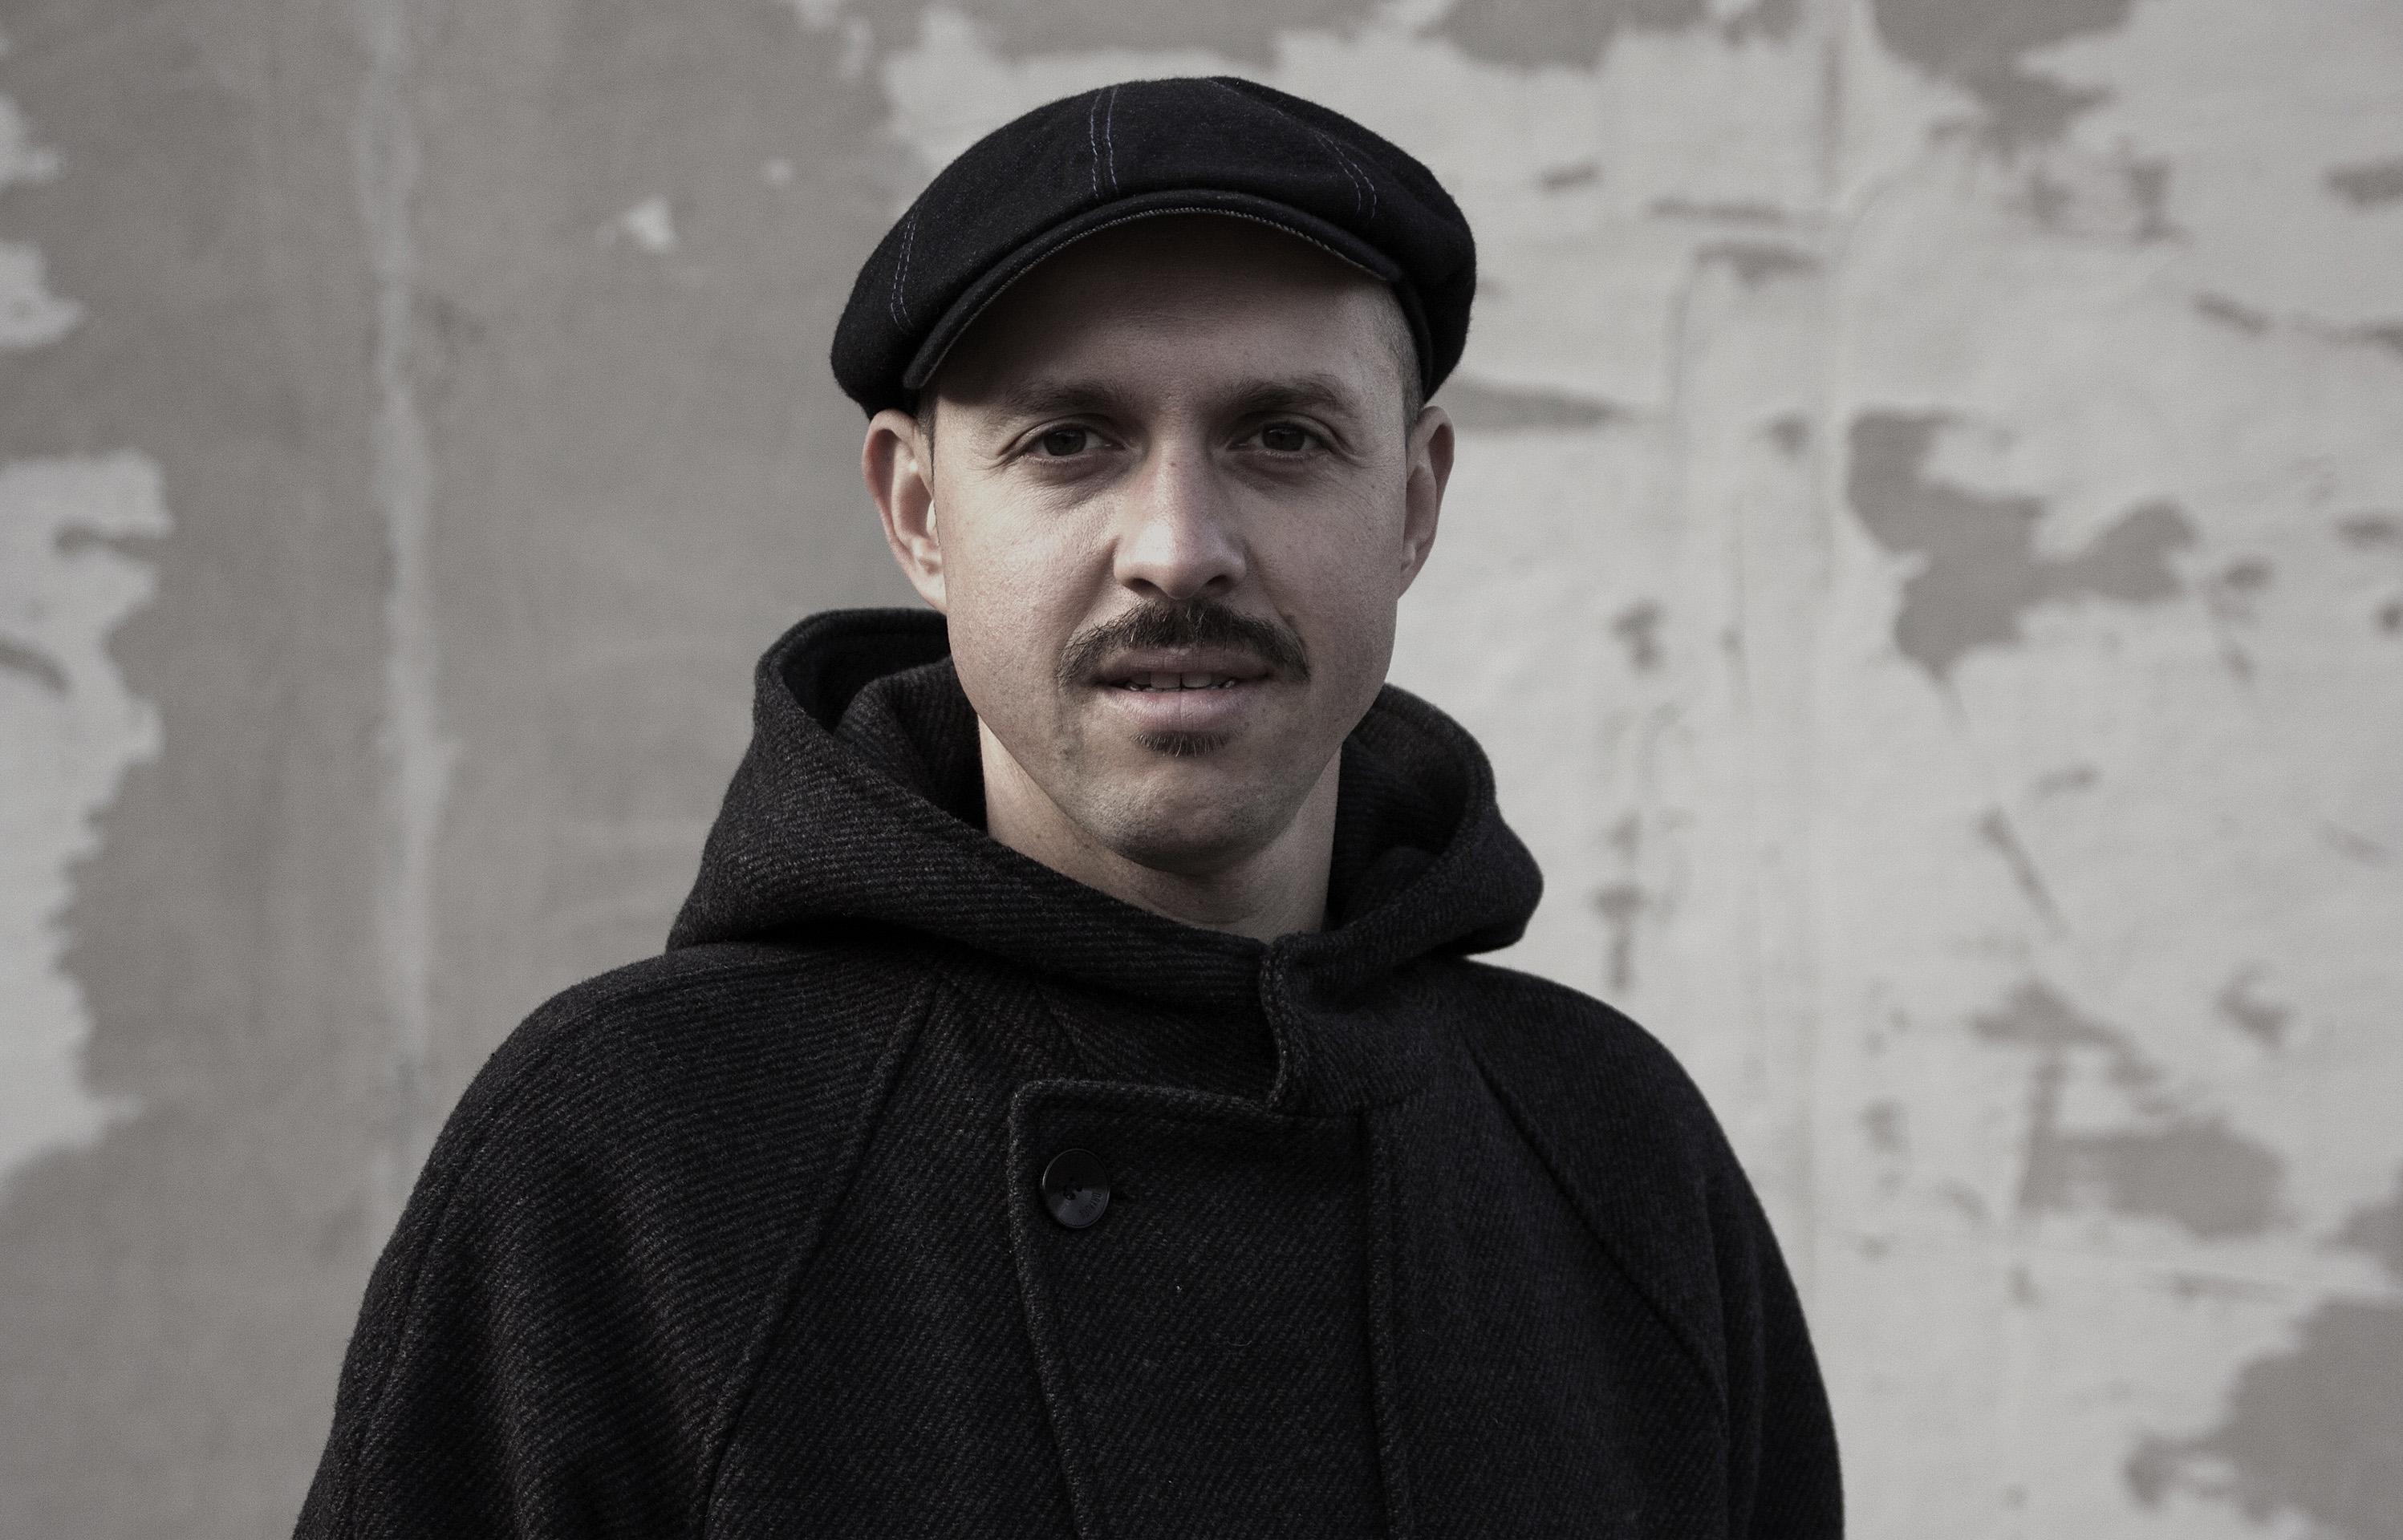 interview sandrino electronic music industry music savage thrills savagethrills